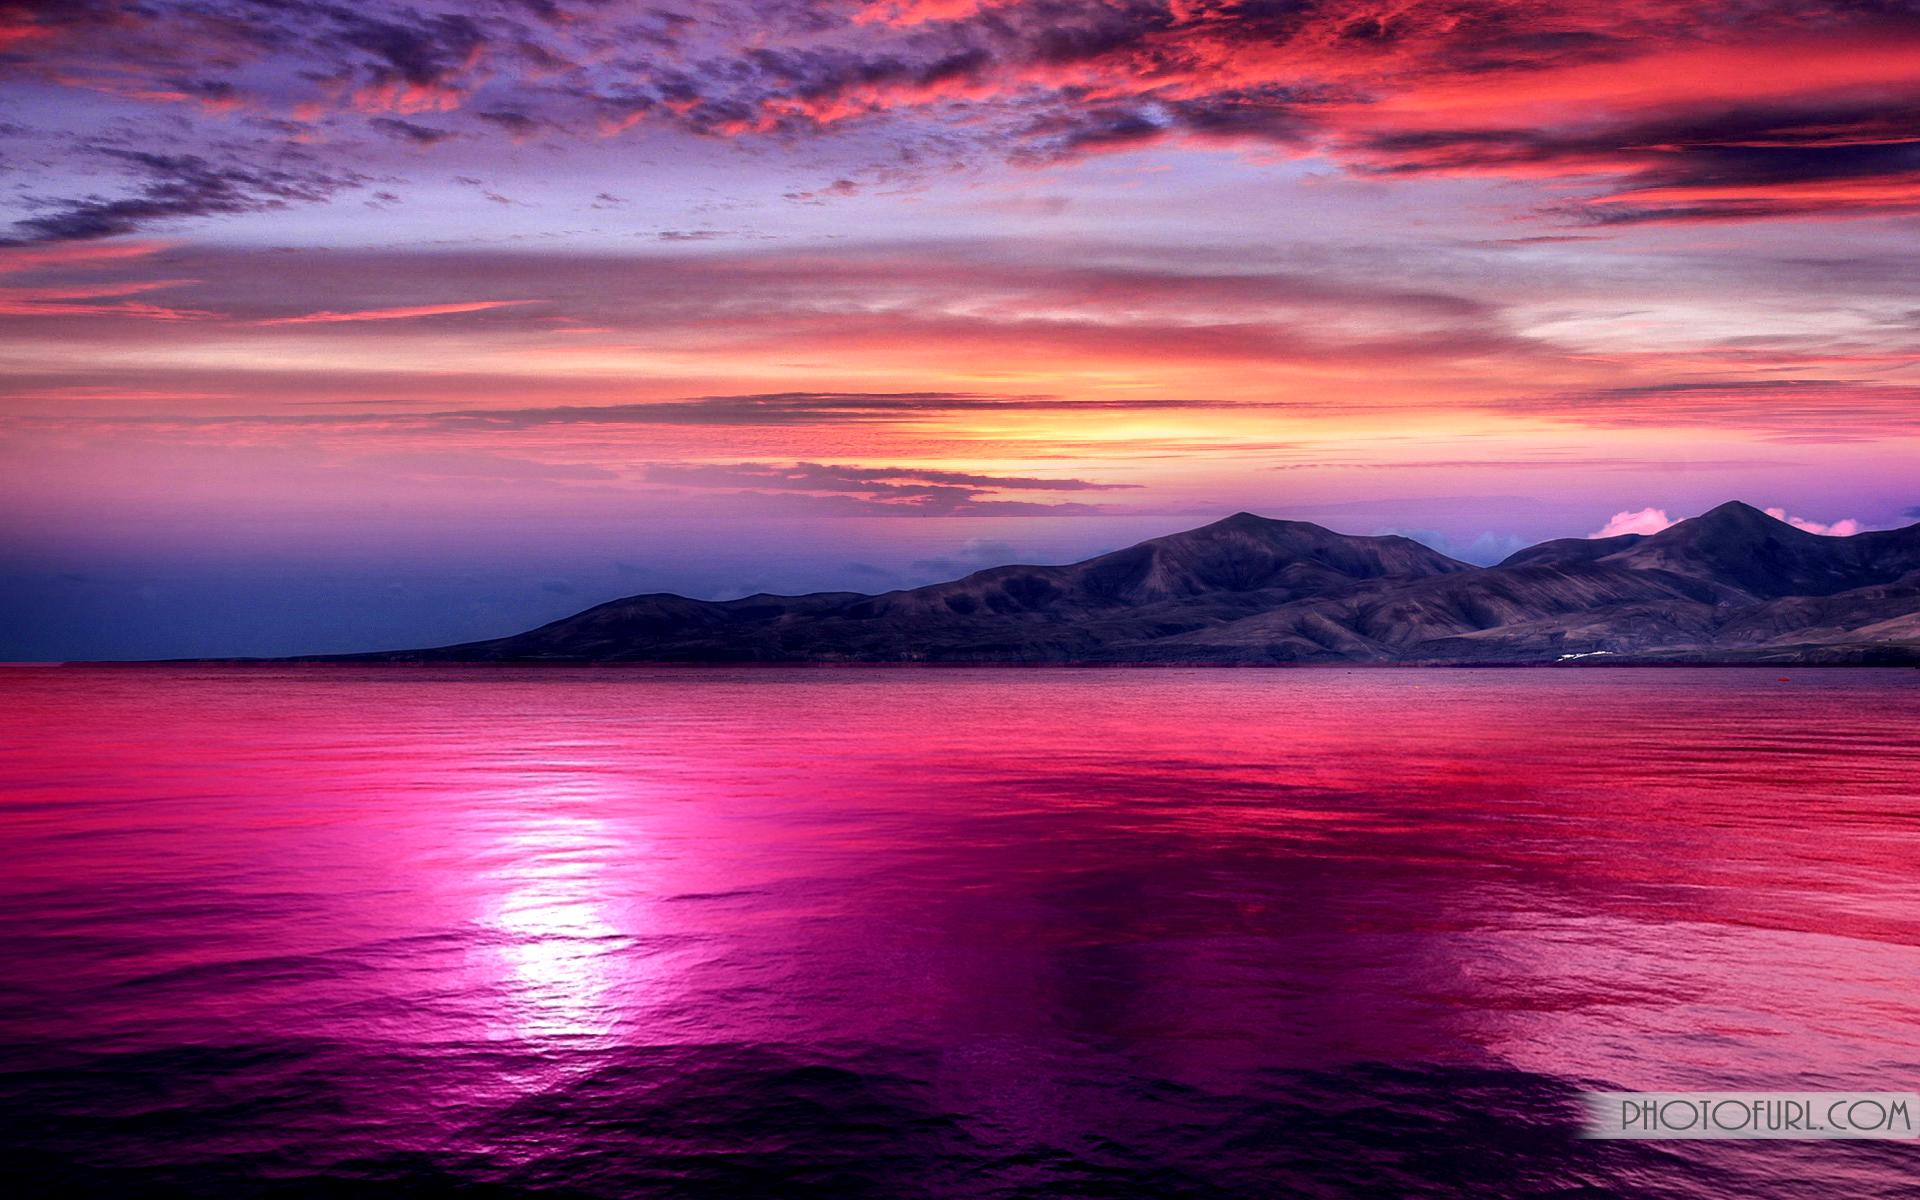 image beaches wallpaper island beauty fabulous 1920x1200 1920x1200